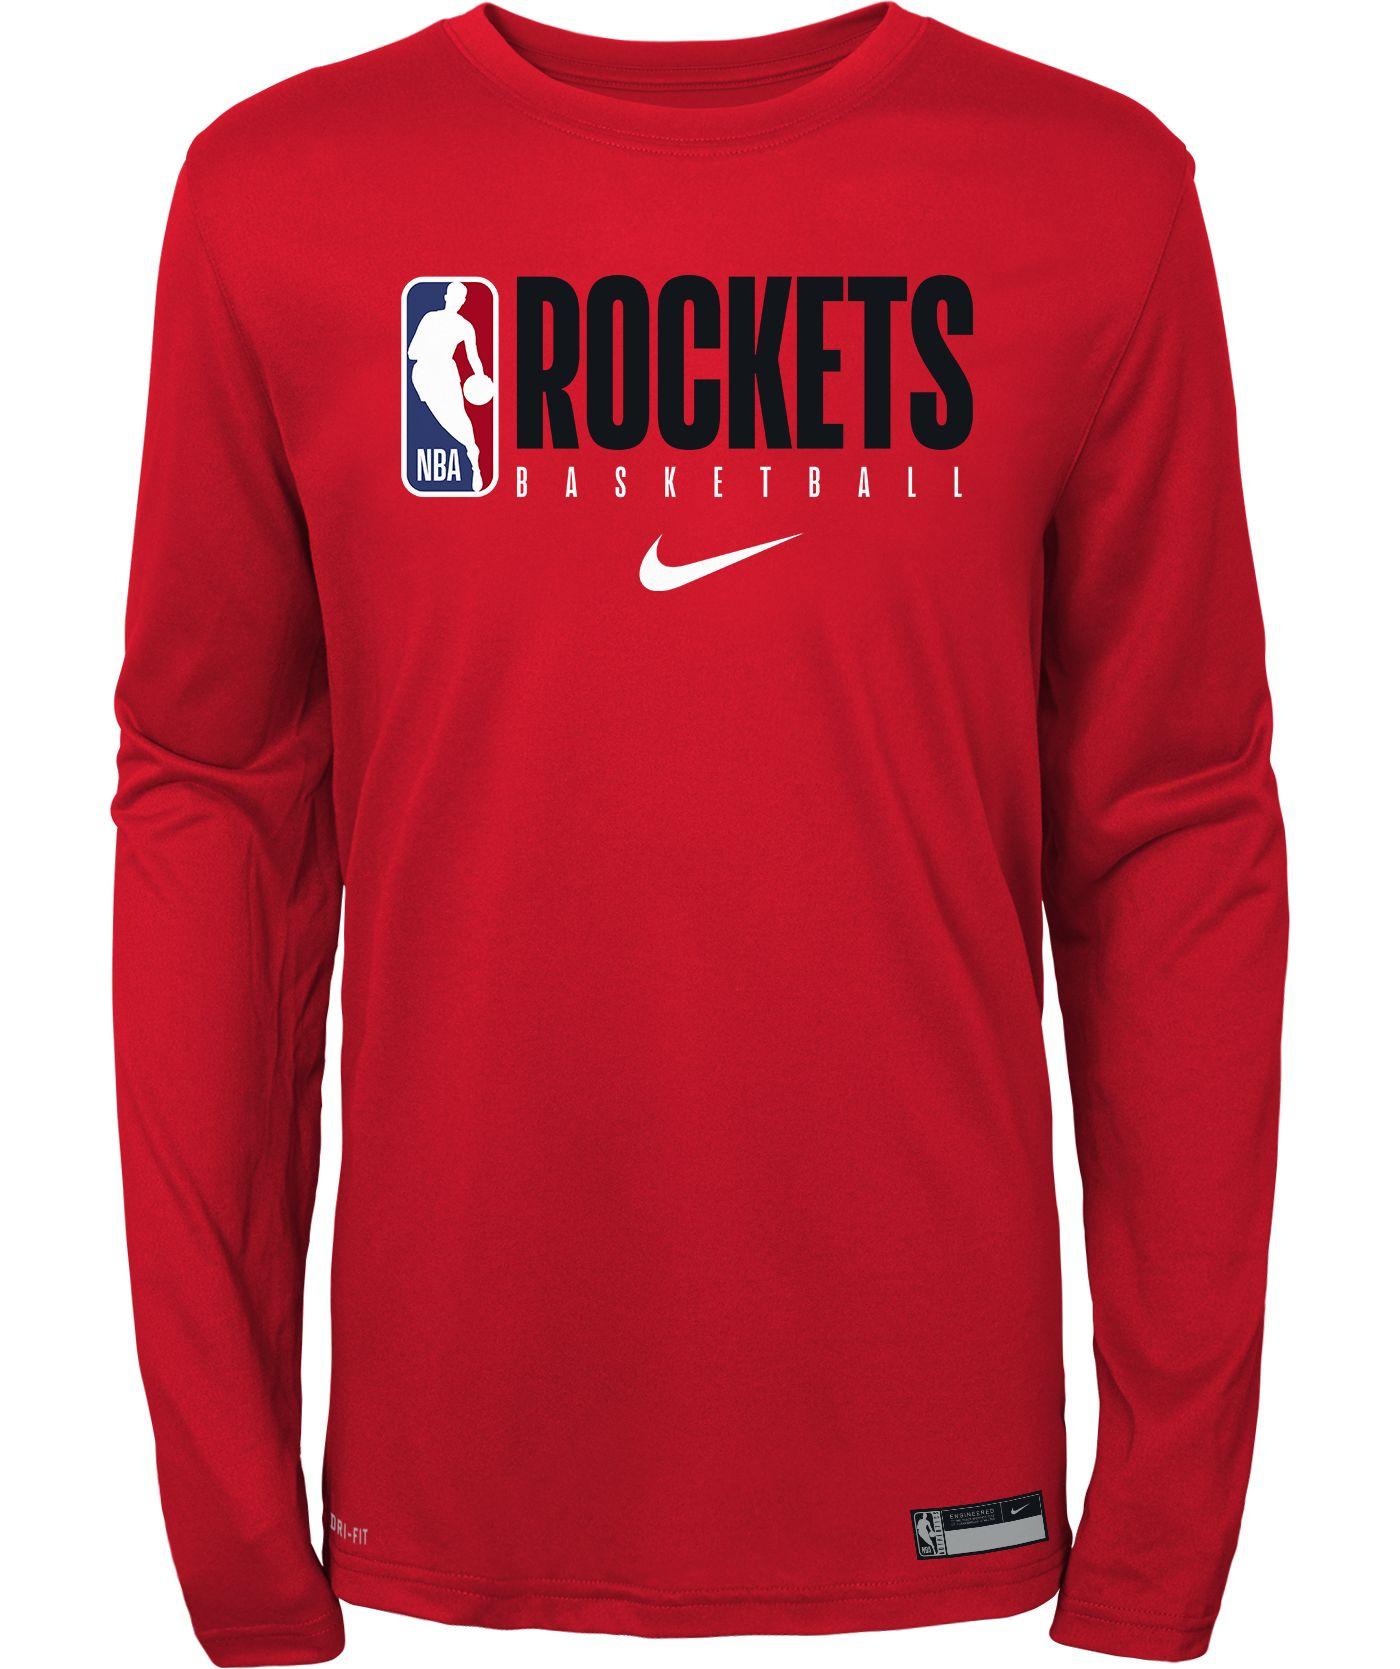 Nike Youth Houston Rockets Dri-FIT Practice Long Sleeve Shirt